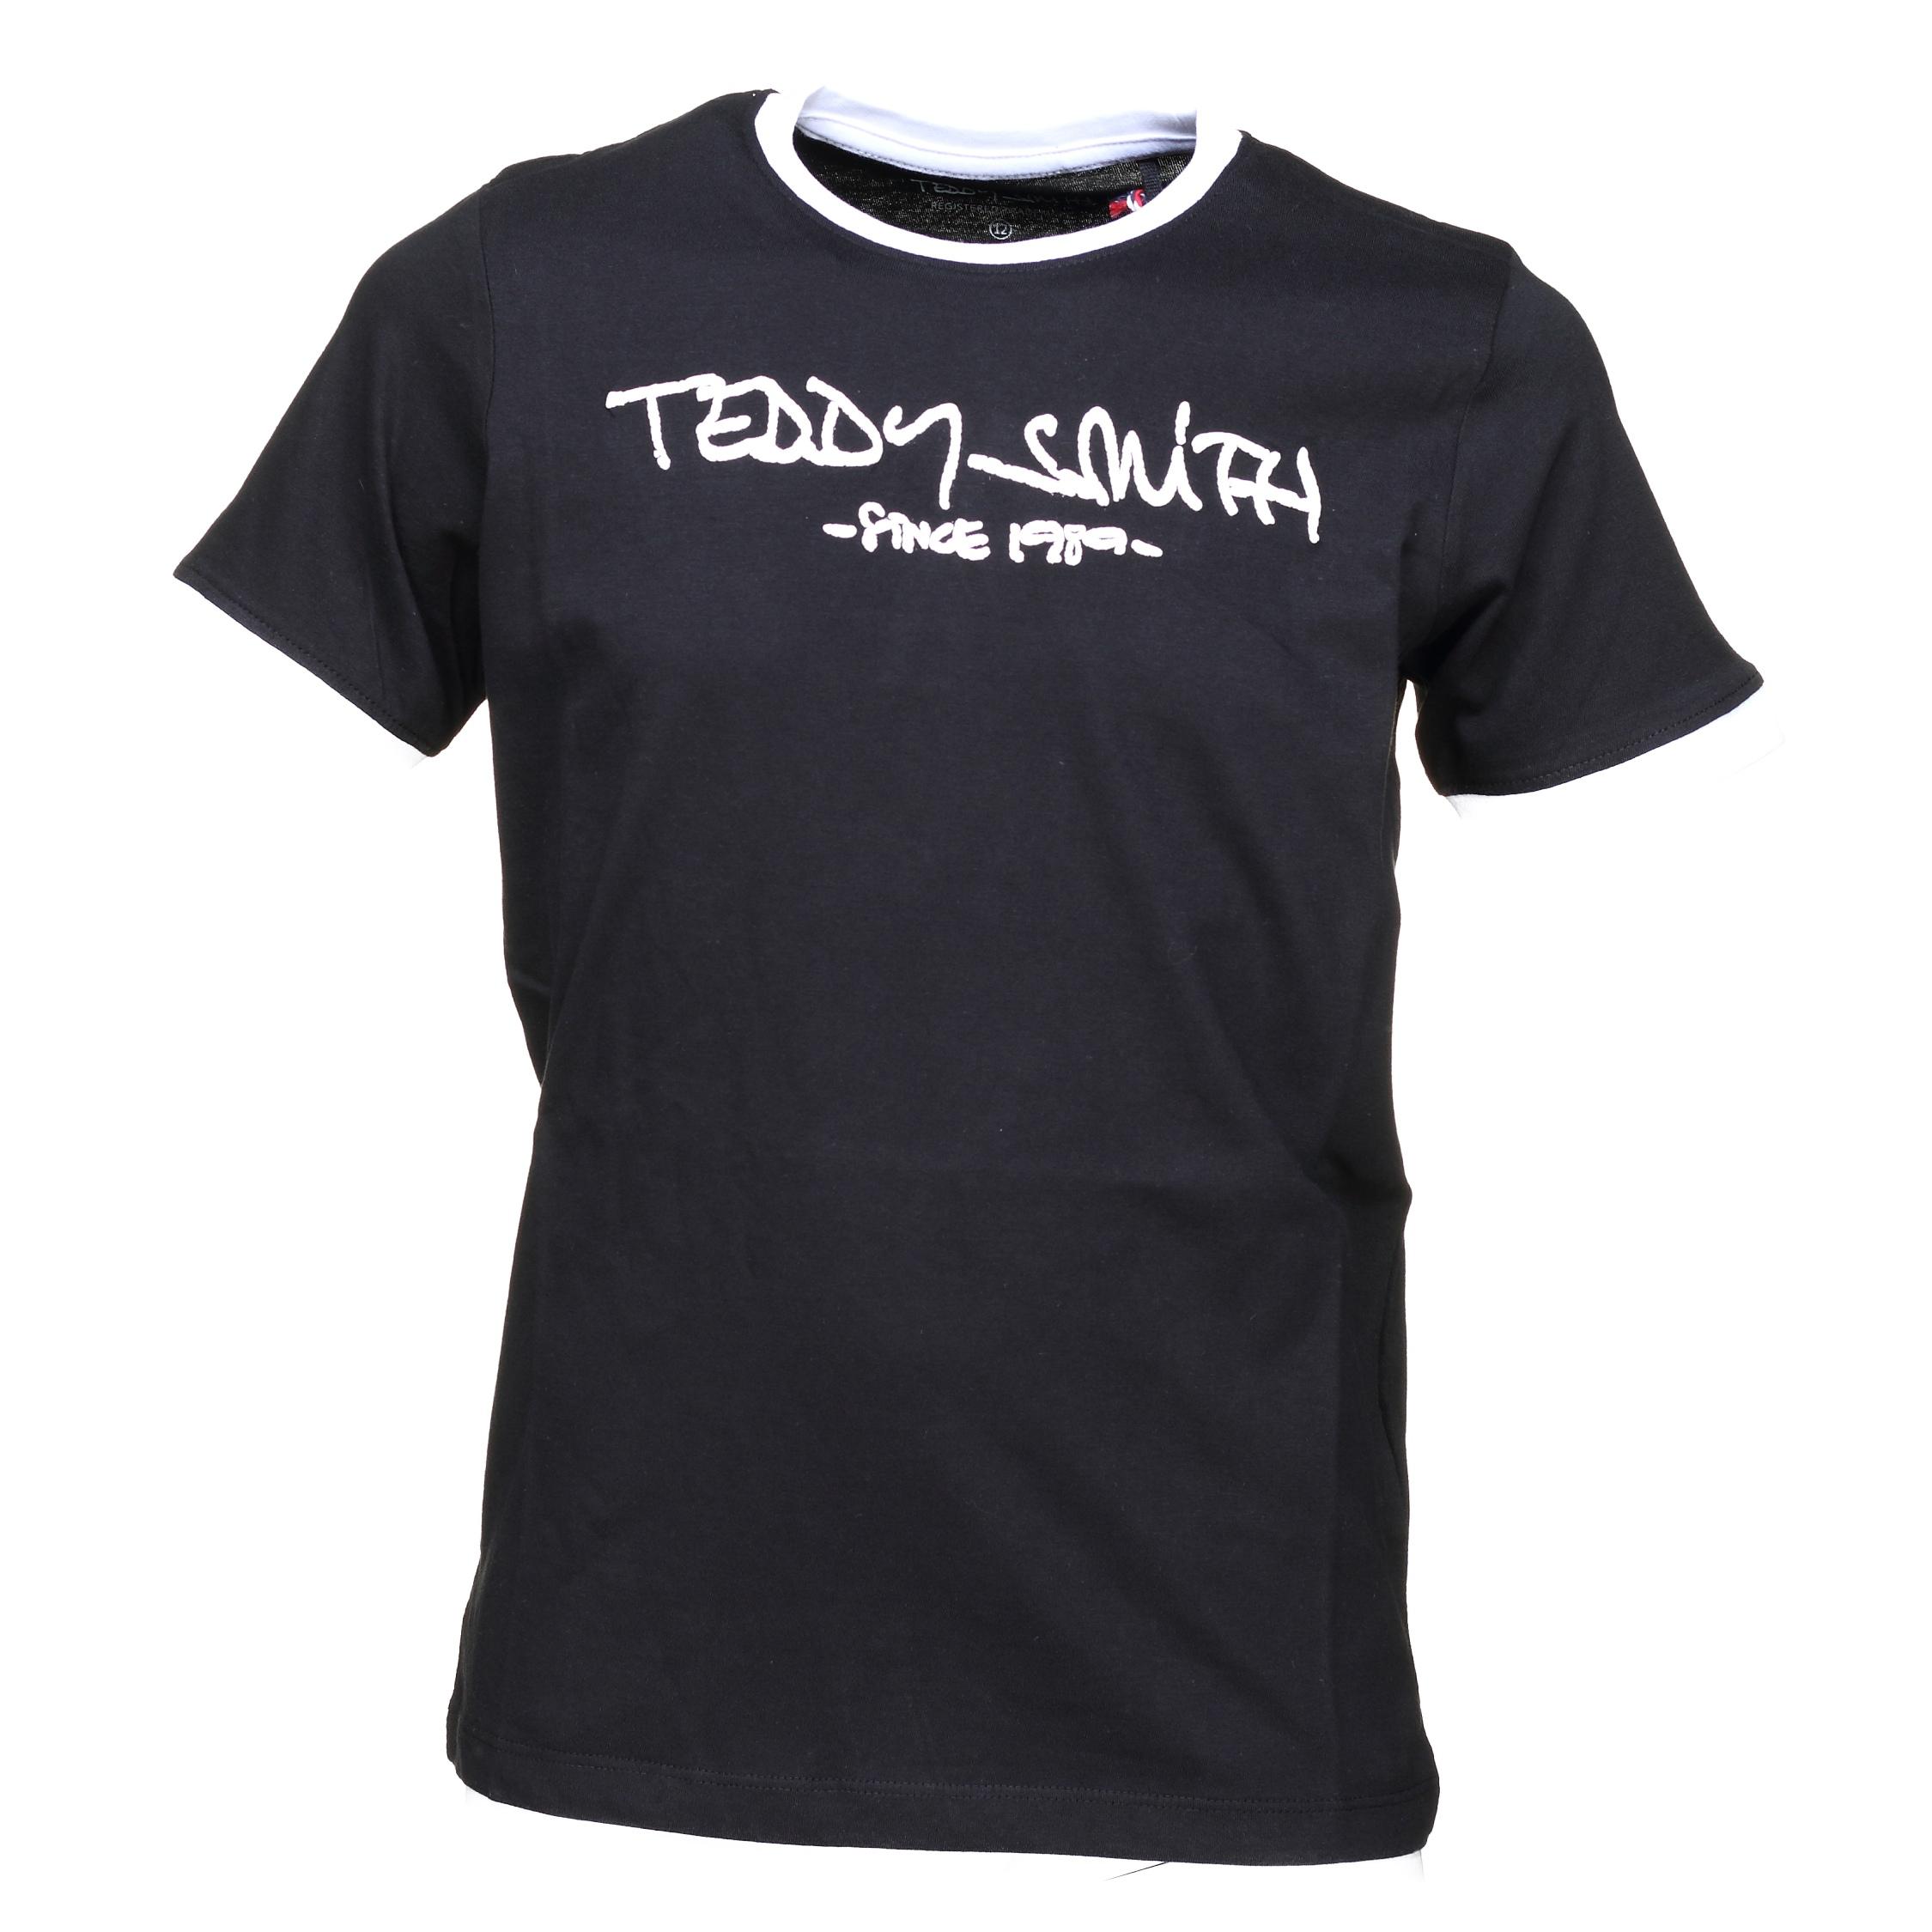 https://www.leadermode.com/176580/teddy-smith-ticlass3-mc-61002433d-171z4-noir-blanc.jpg